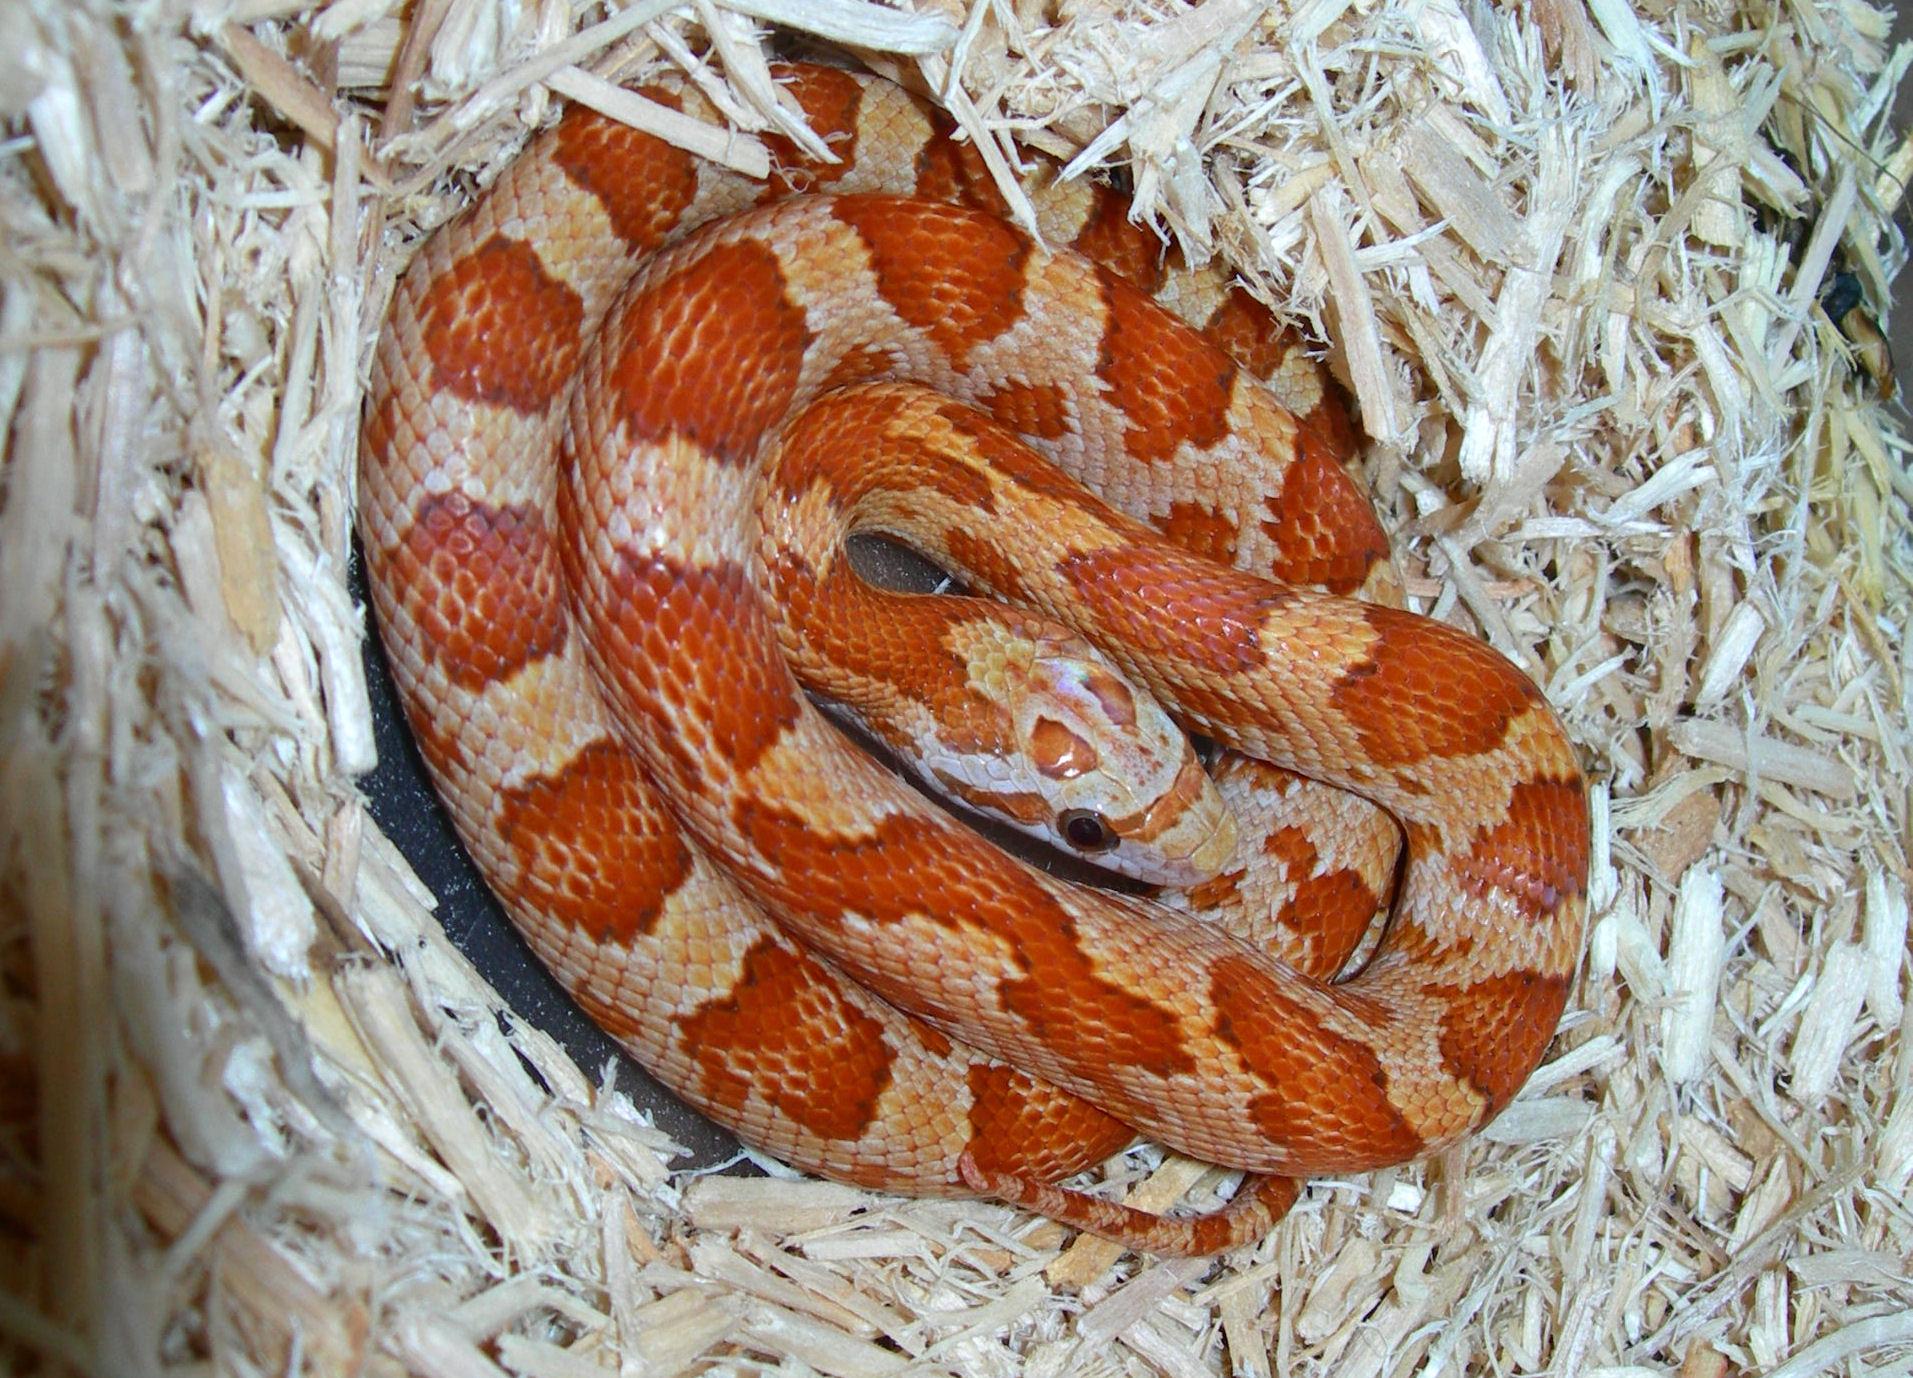 '07 Cinnamon Hatchling